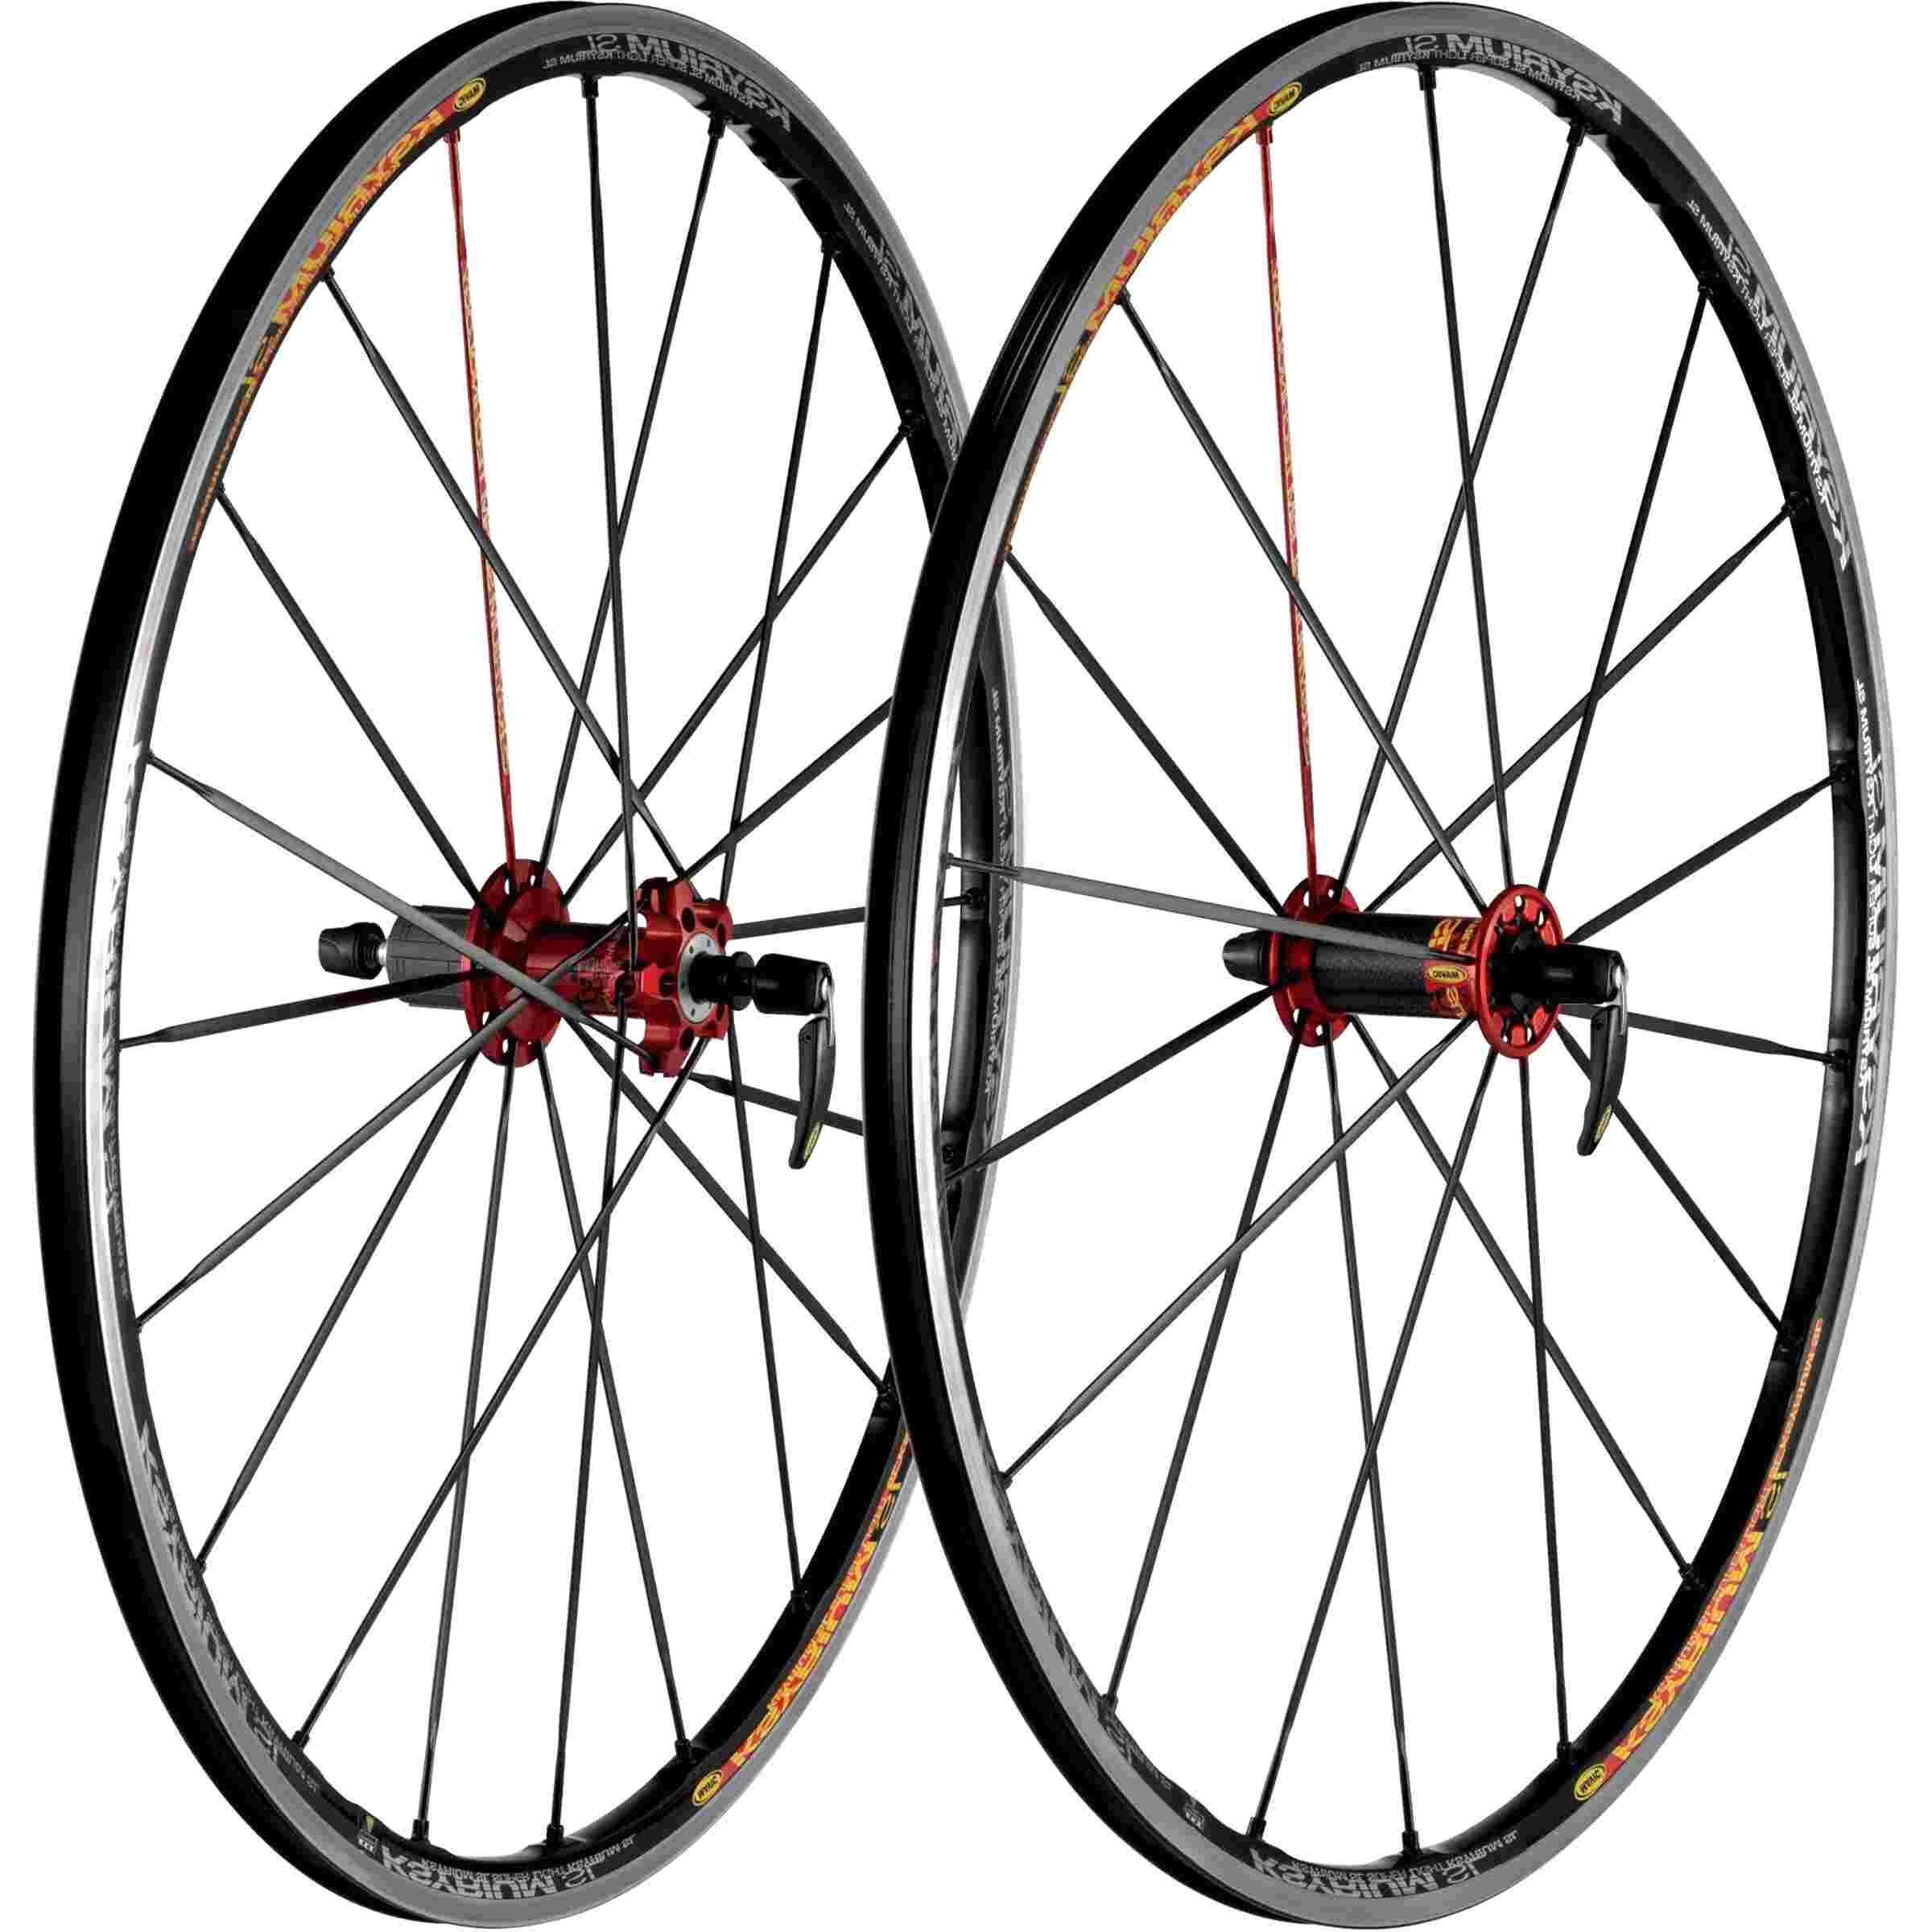 USED Mavic Ksyrium SL Rear Non Drive Side Wheel Spoke 304mm Black Road Bike